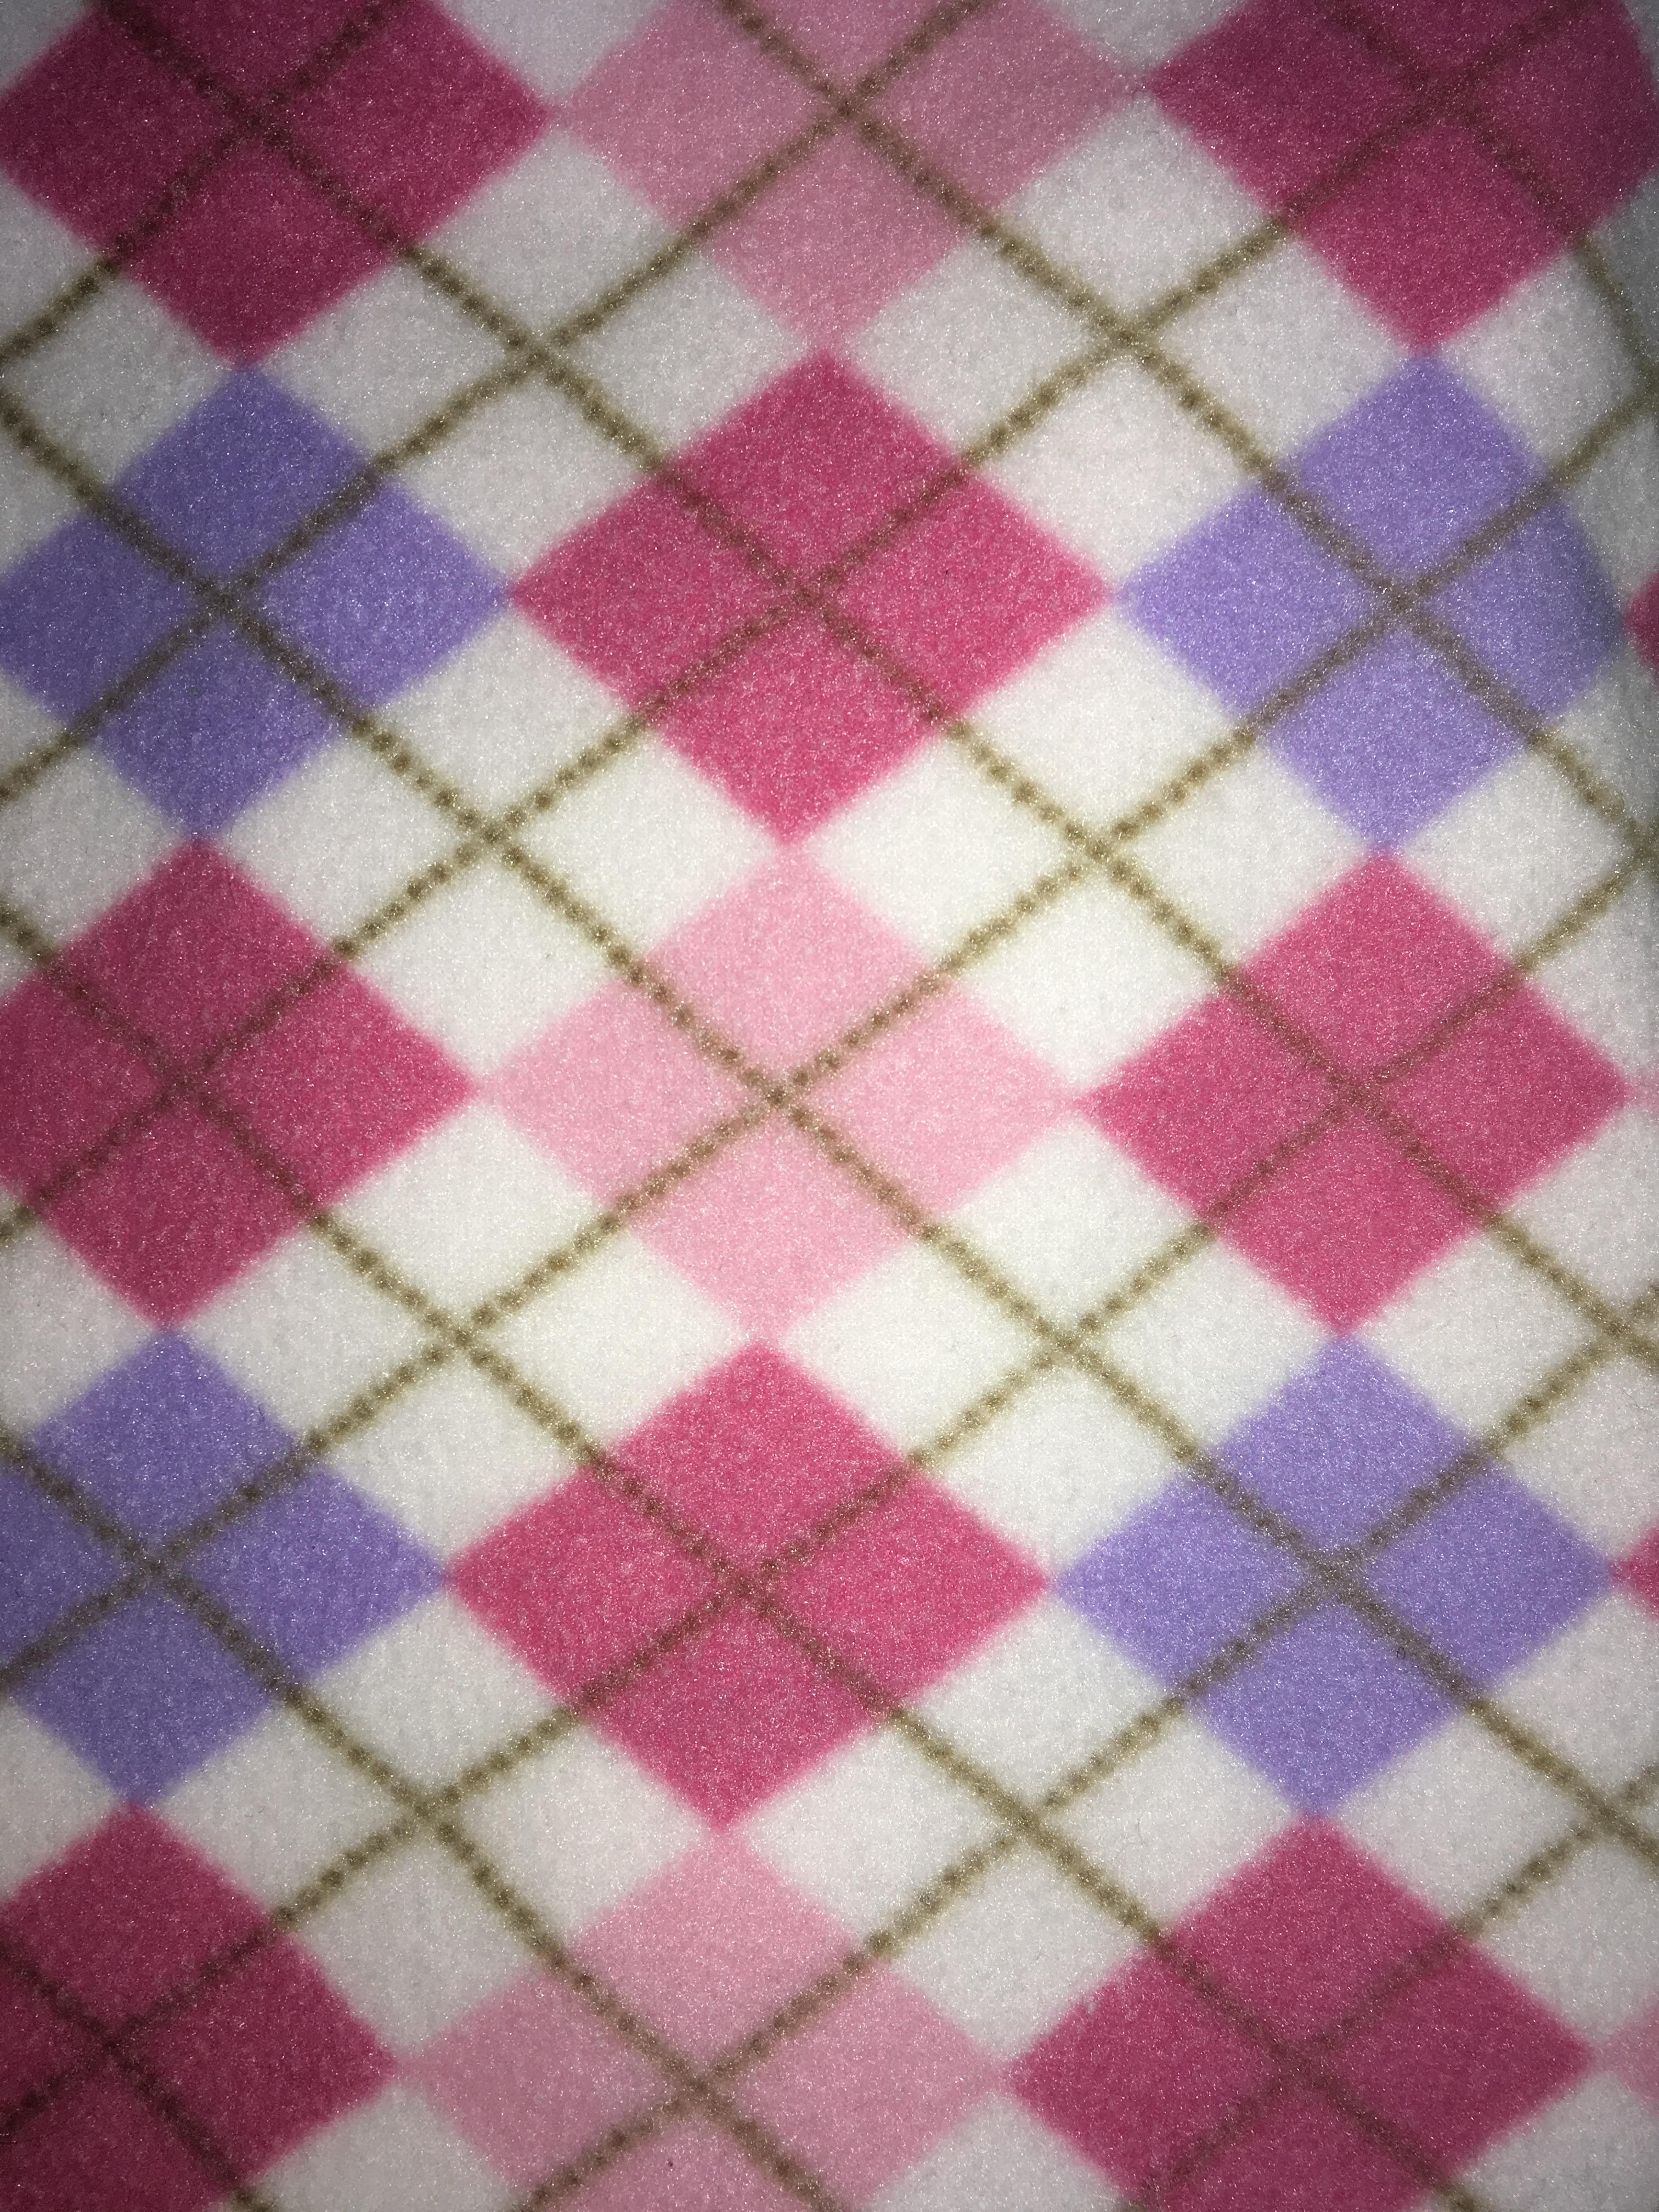 Pink/Lavender Argyle